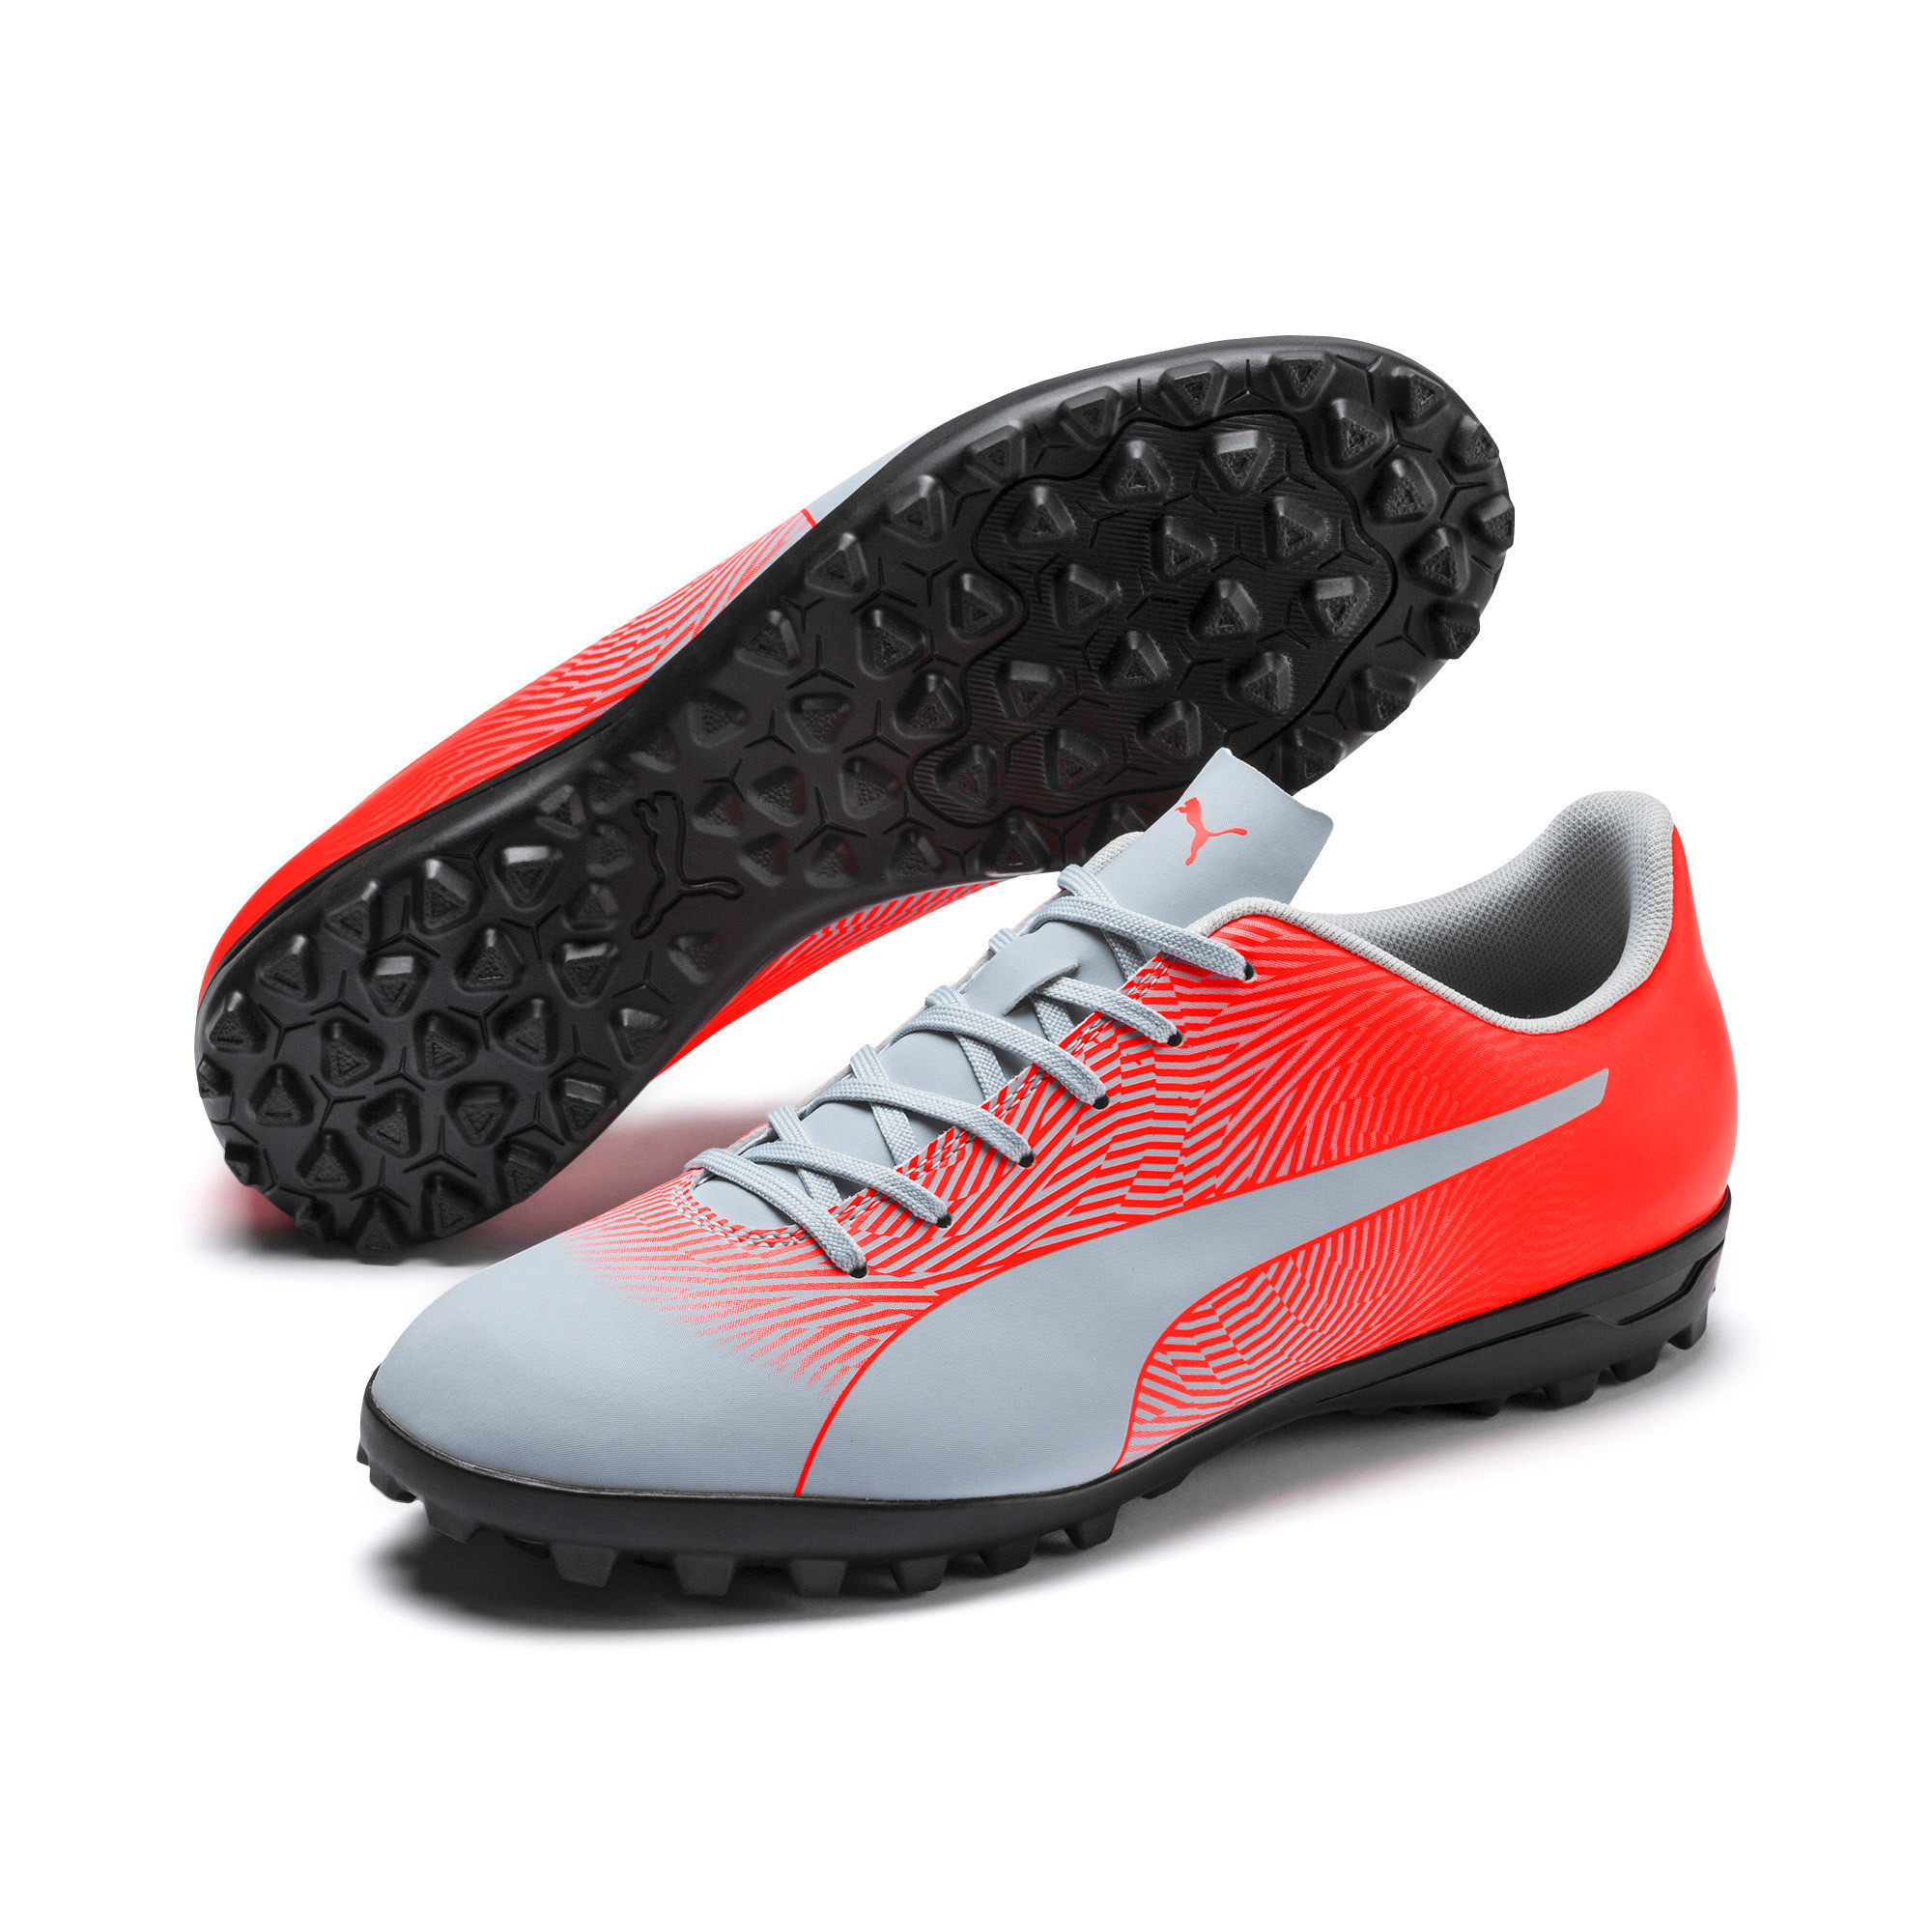 Thumbnail 2 of PUMA Spirit II TT Men's Soccer Shoes, Glacial Blue-Nrgy Red, medium